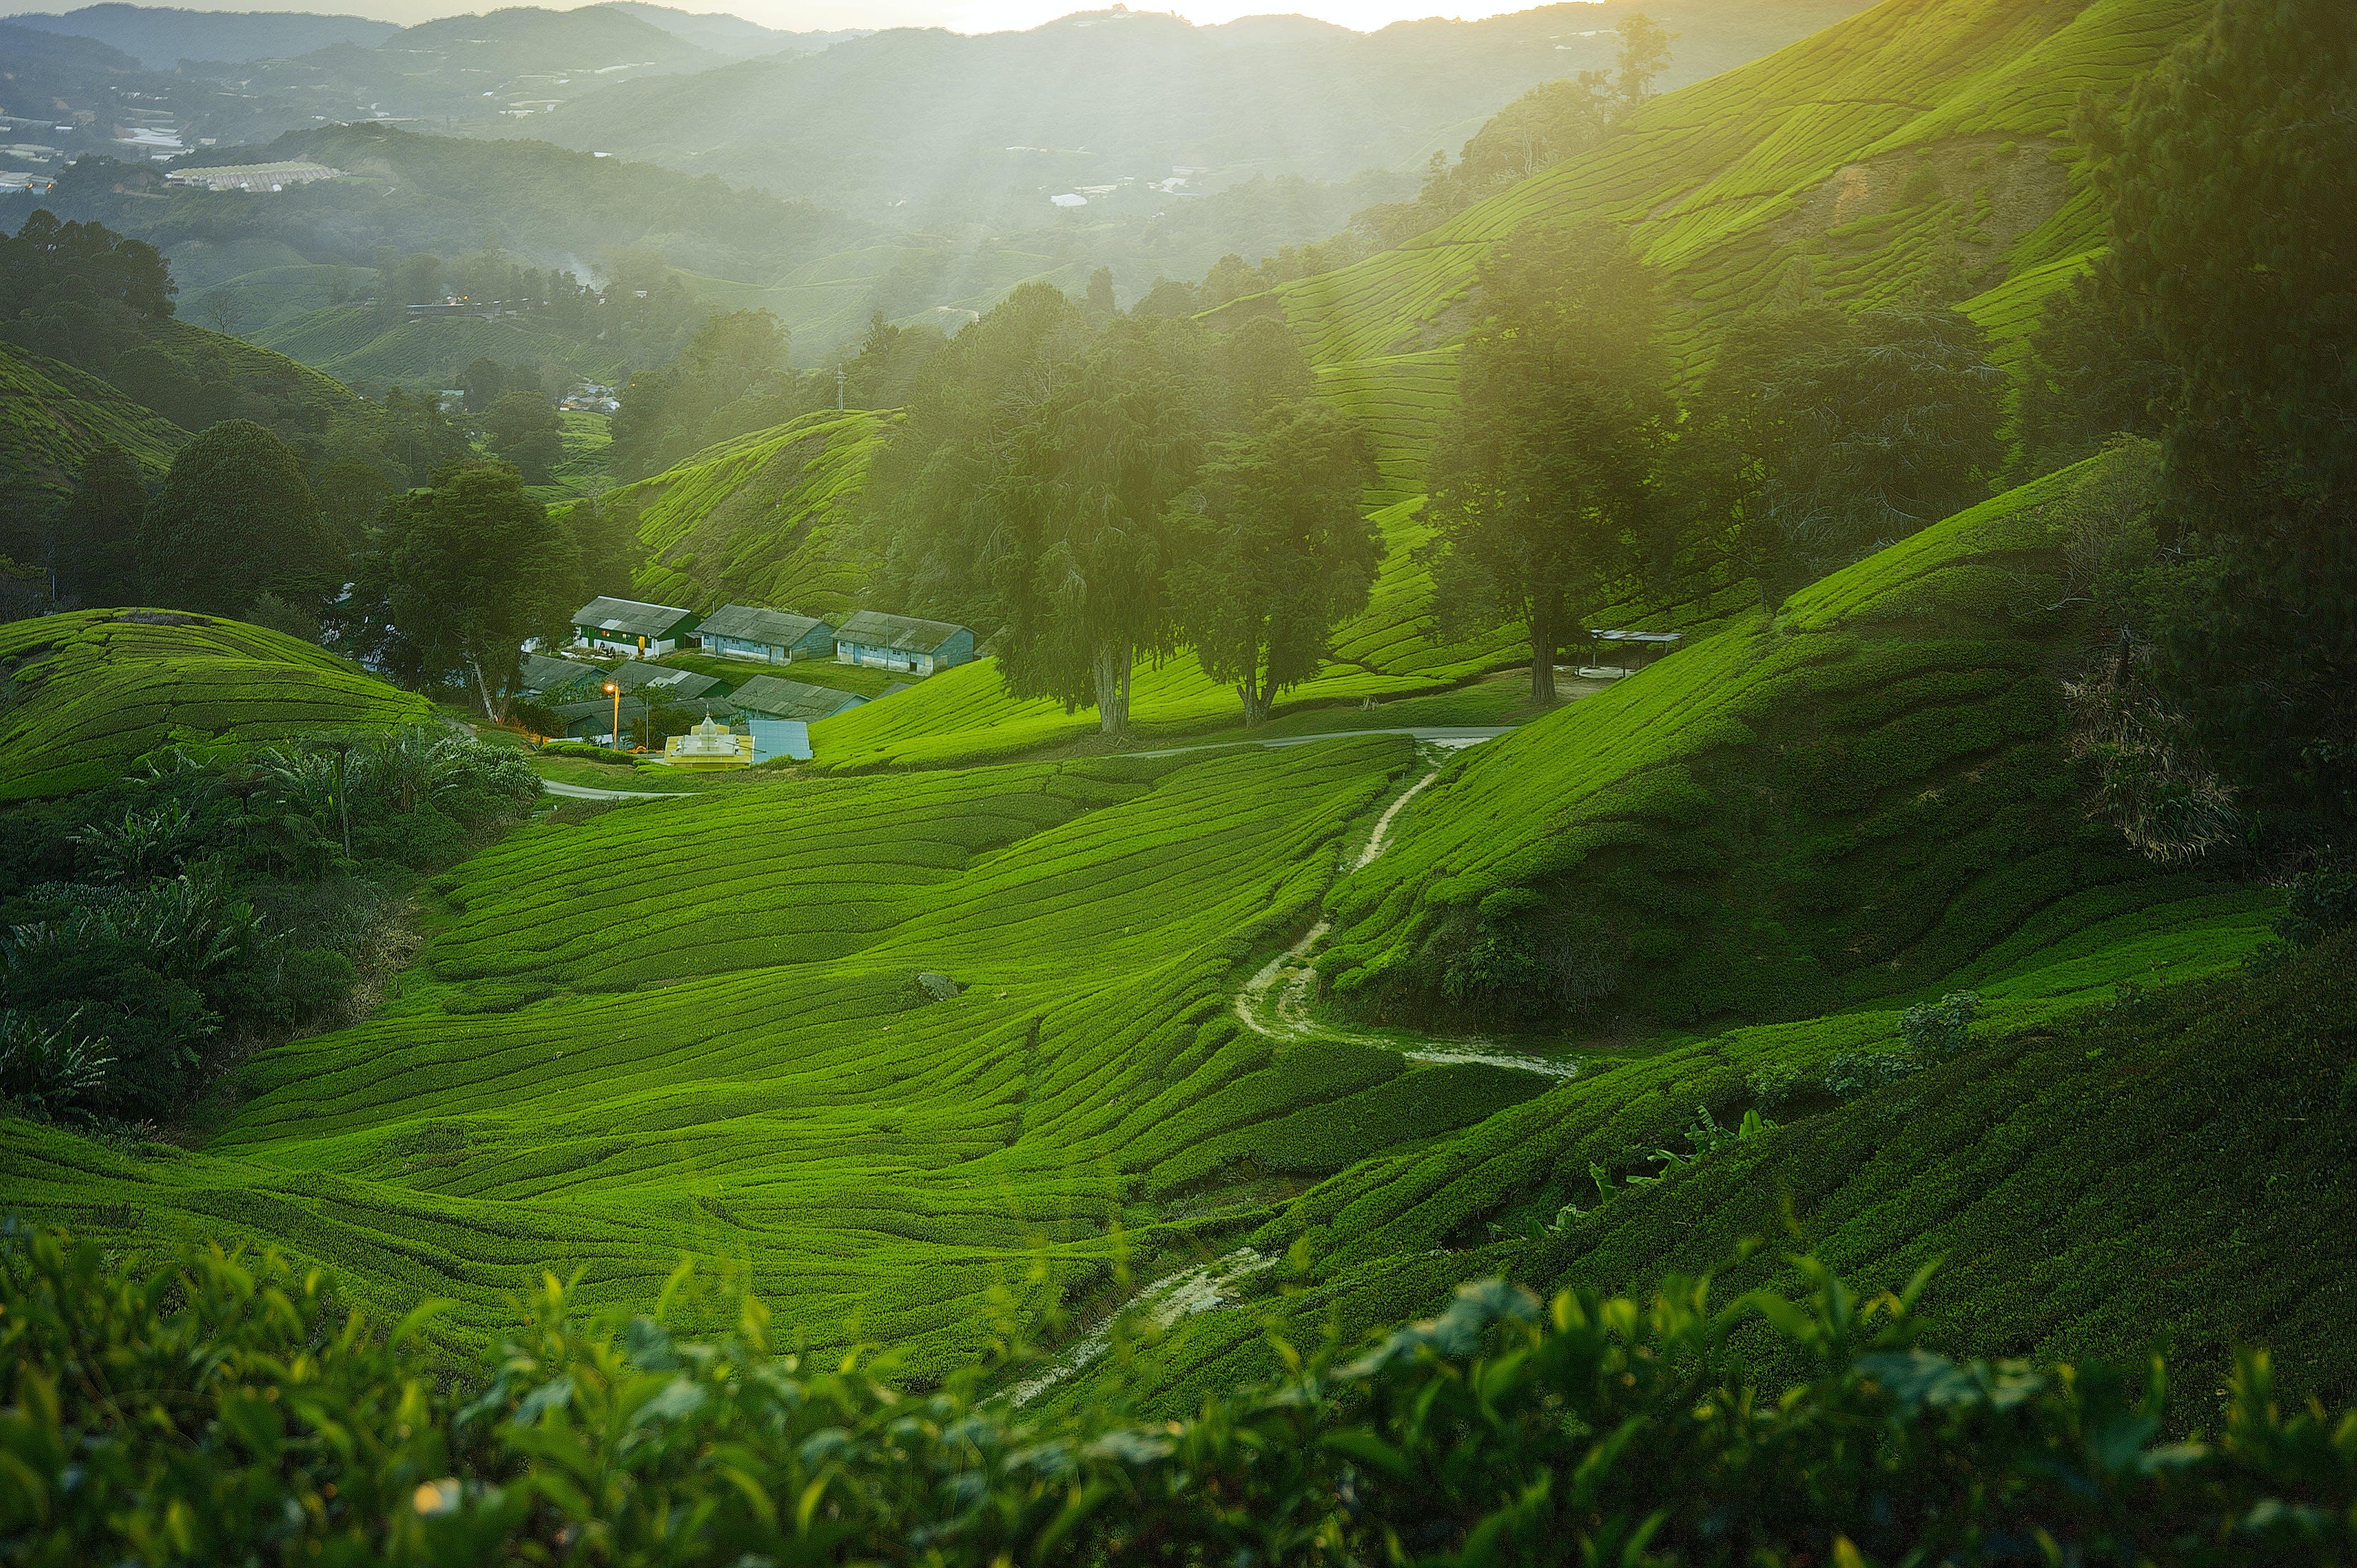 Fotos de stock gratuitas de amanecer, árbol, campo, campo de heno